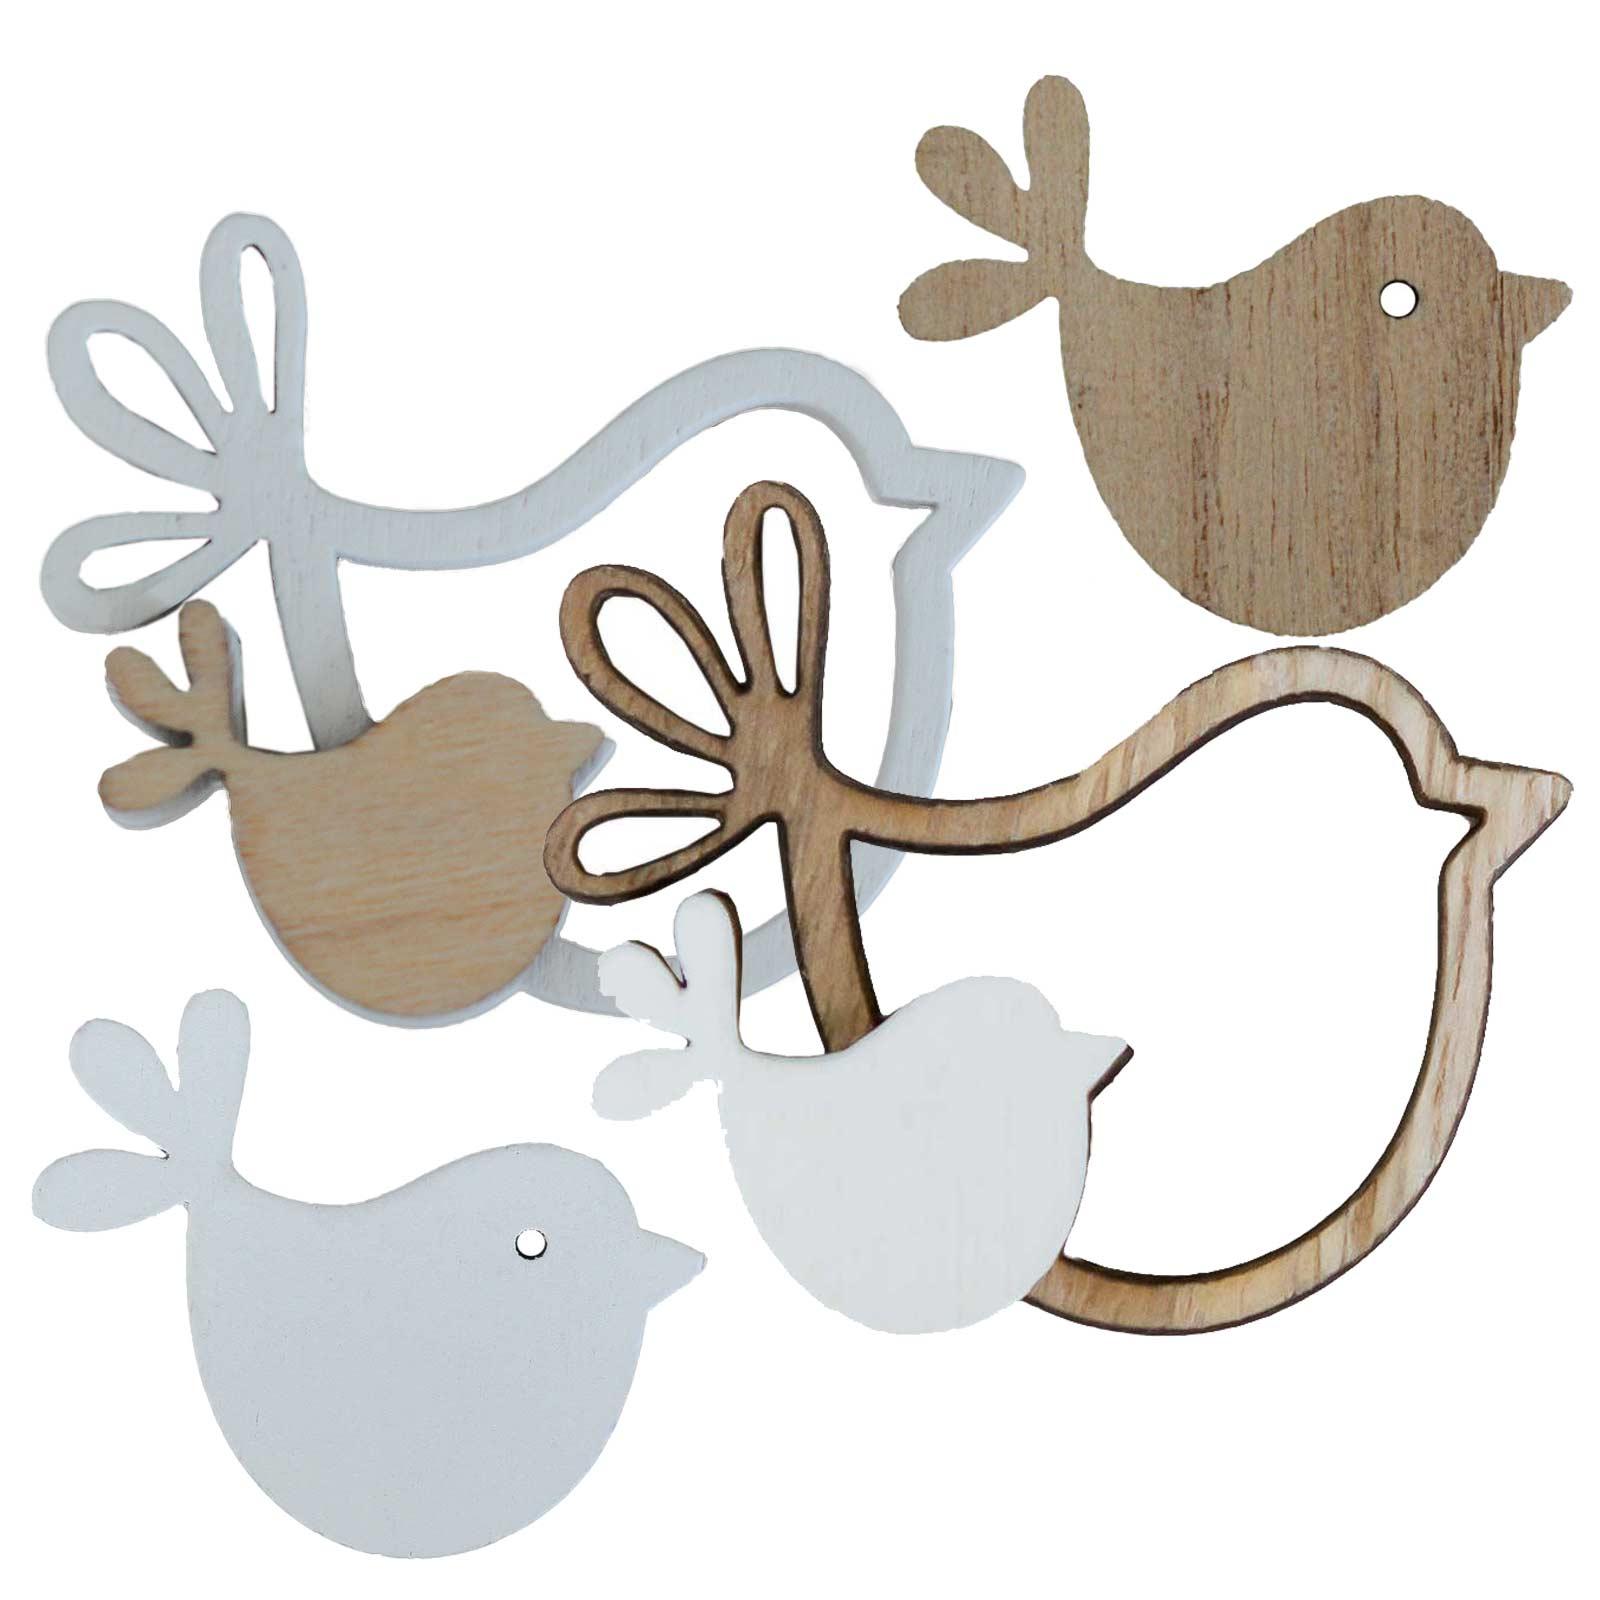 24 Deko Streudeko Streuartikel Vogel Holz - Dekoration, Farbmix – Bild 1